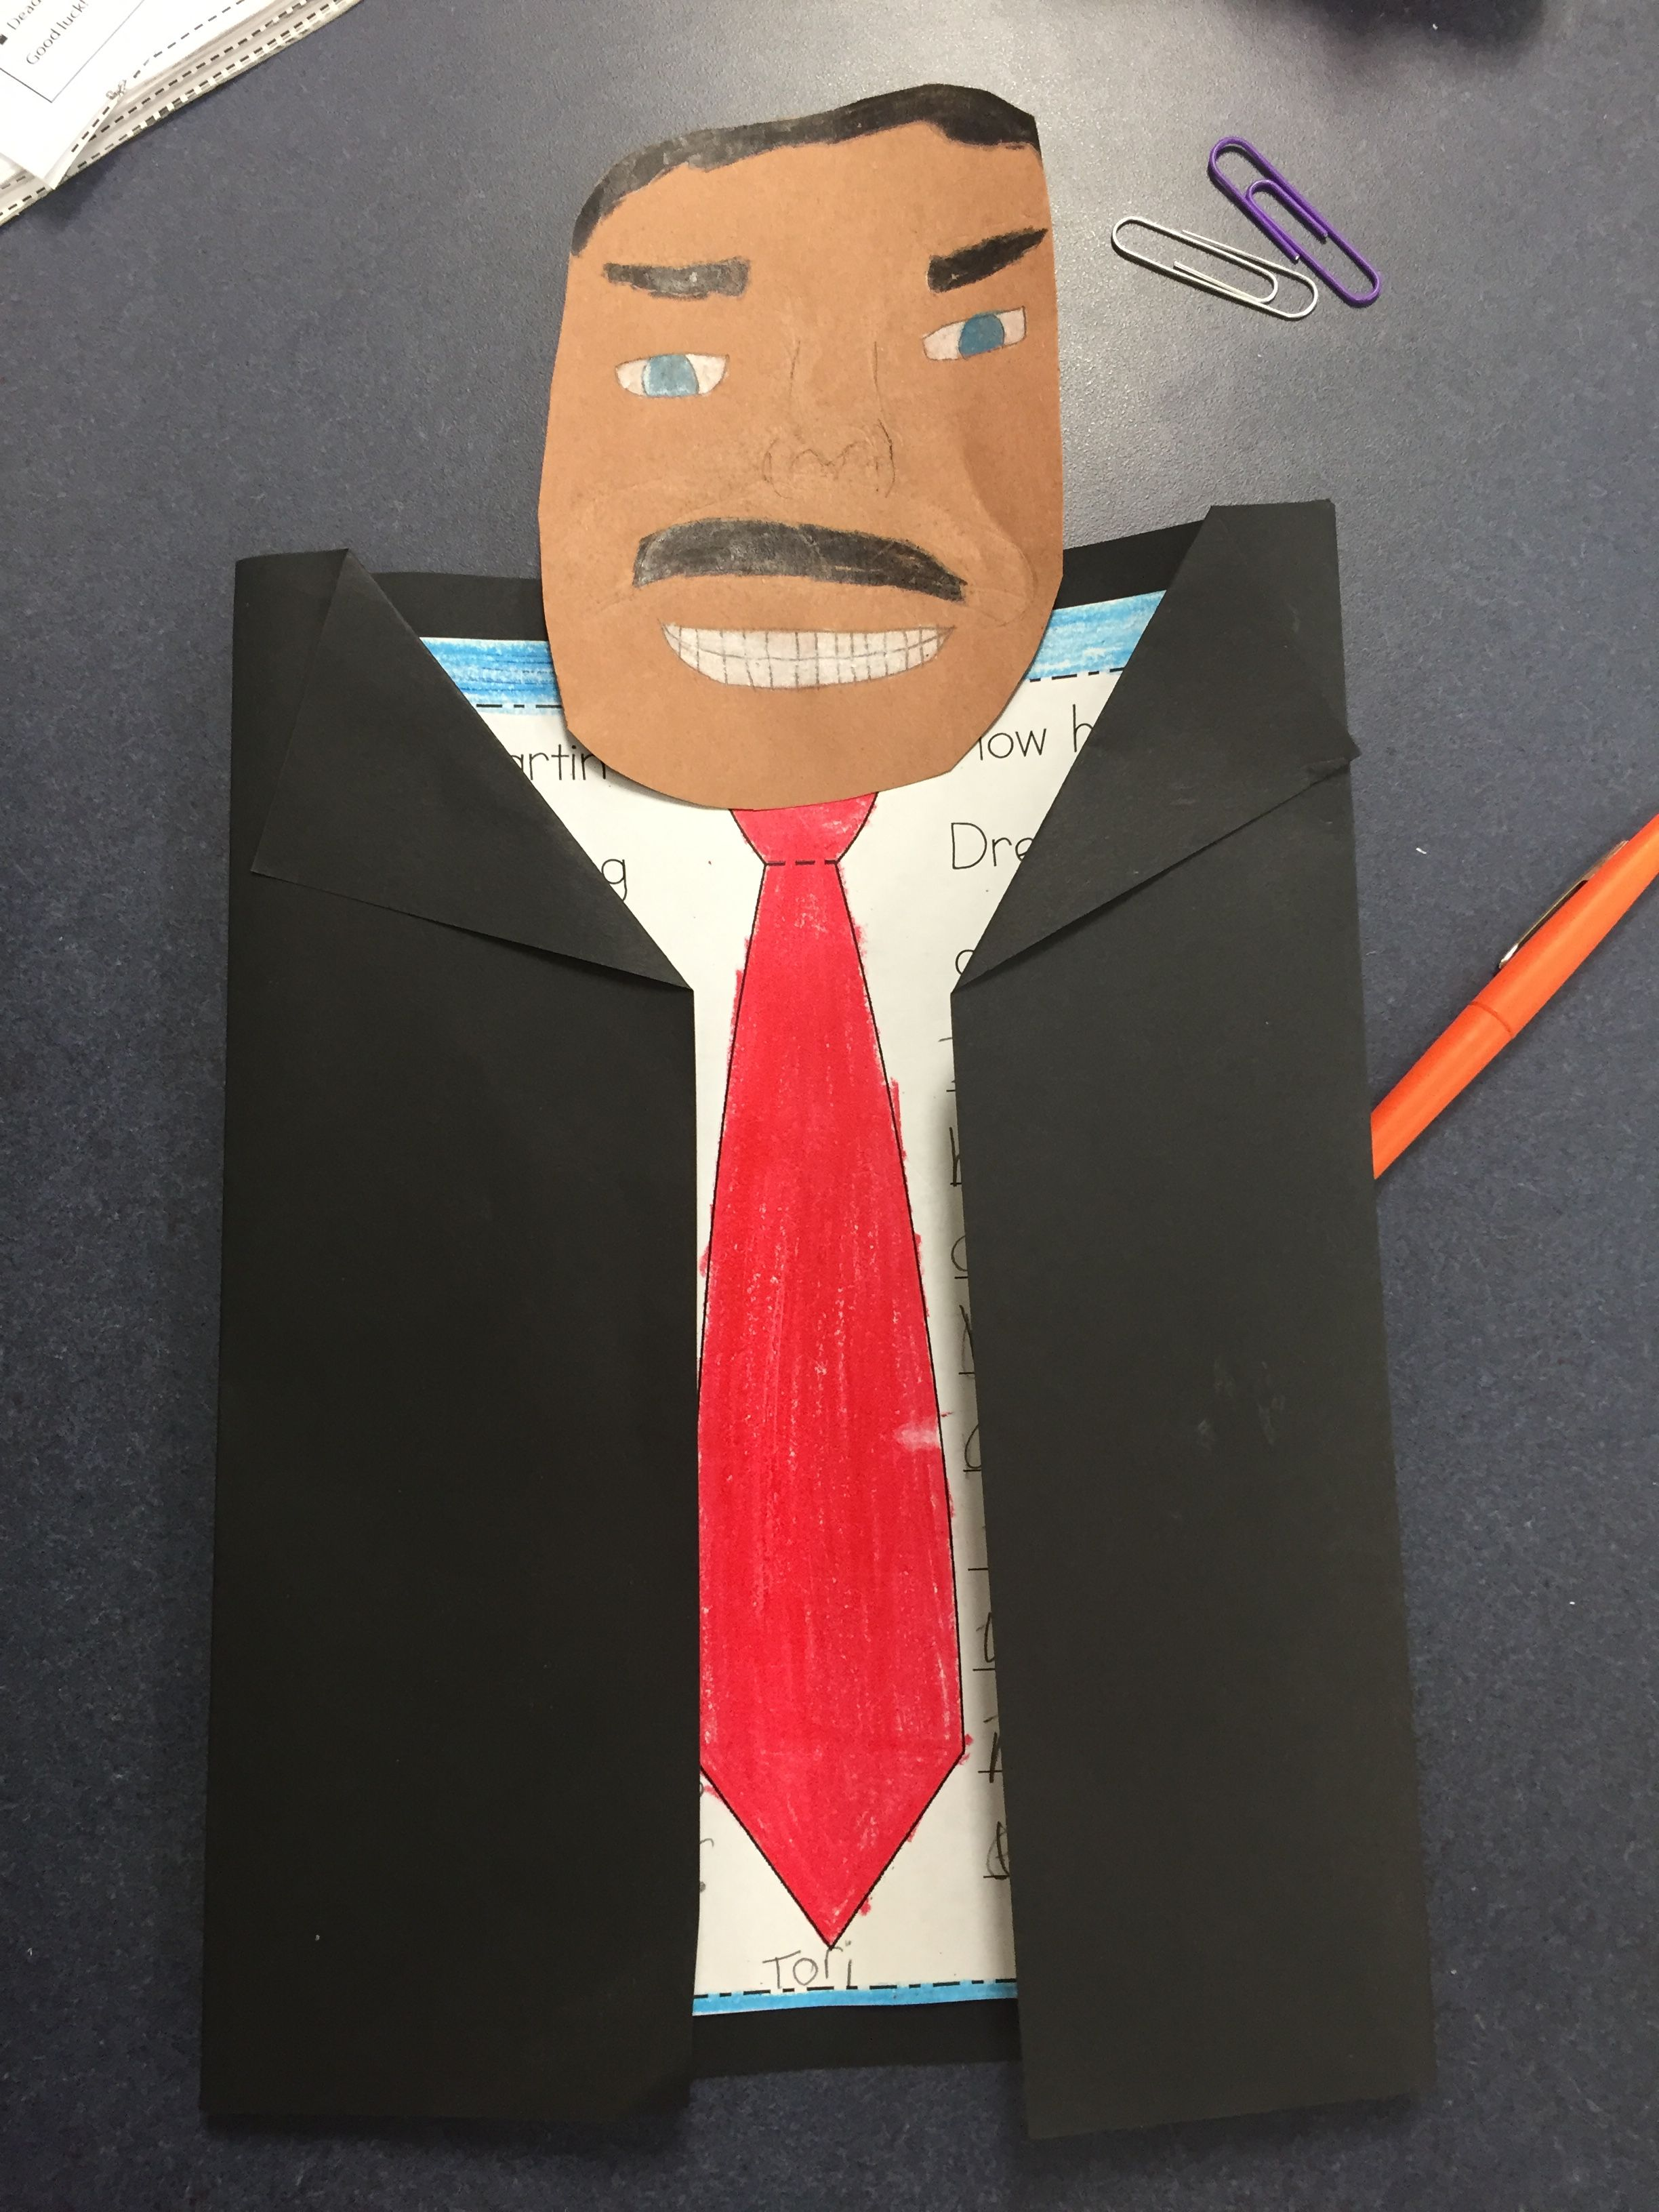 Junior hallway ideas  MLK Jr Martin Luther King Jr craft for fourth grade